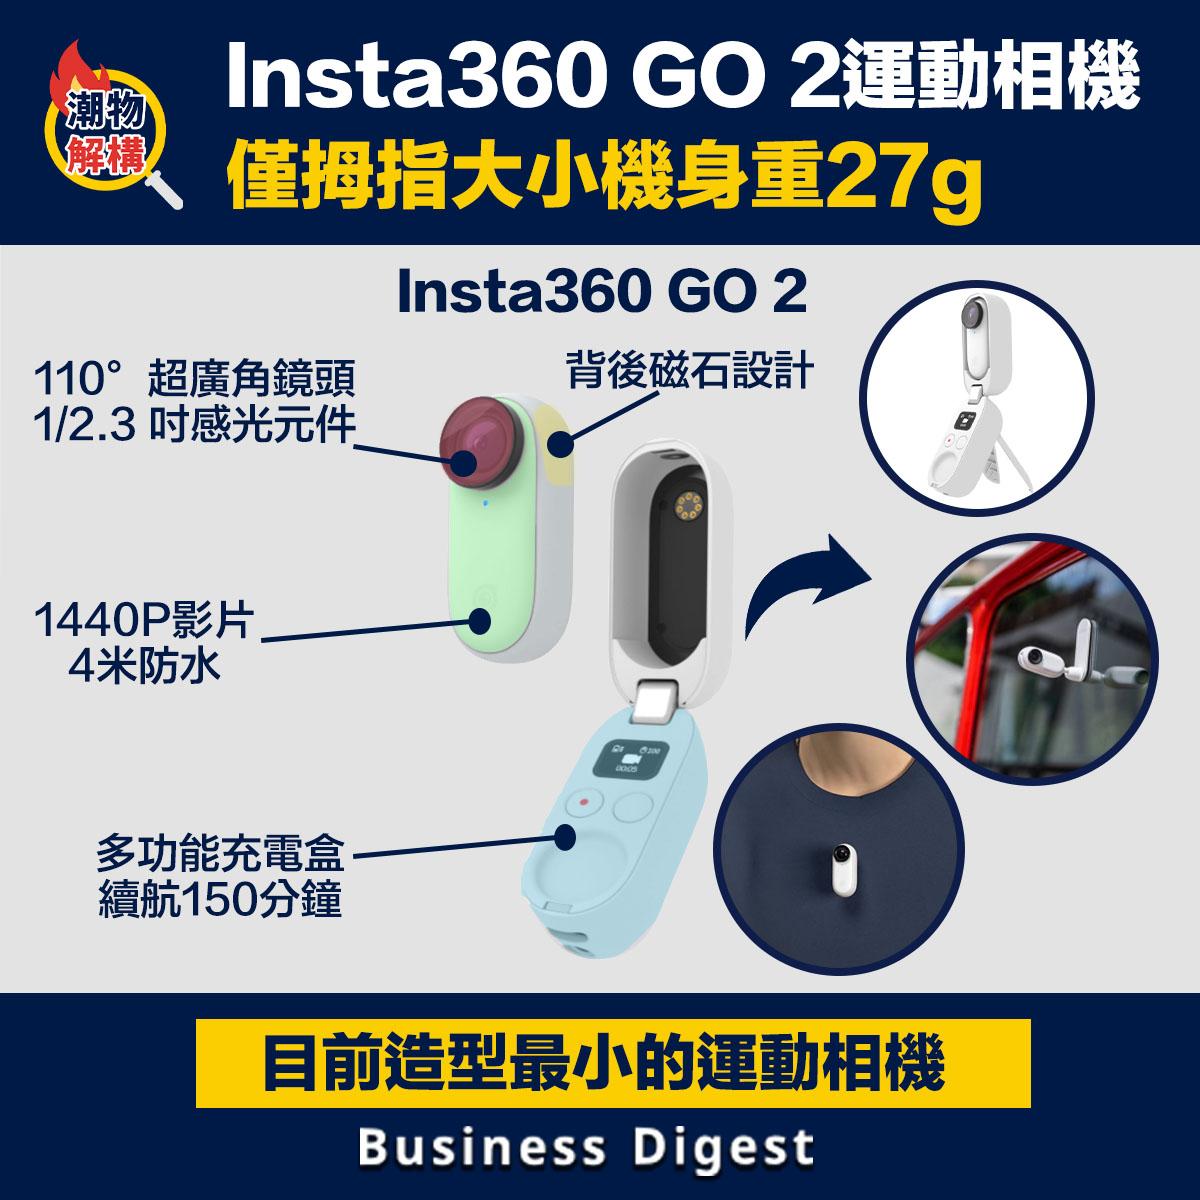 Insta360發表全新運動相機(Action Cam)Insta360 GO 2